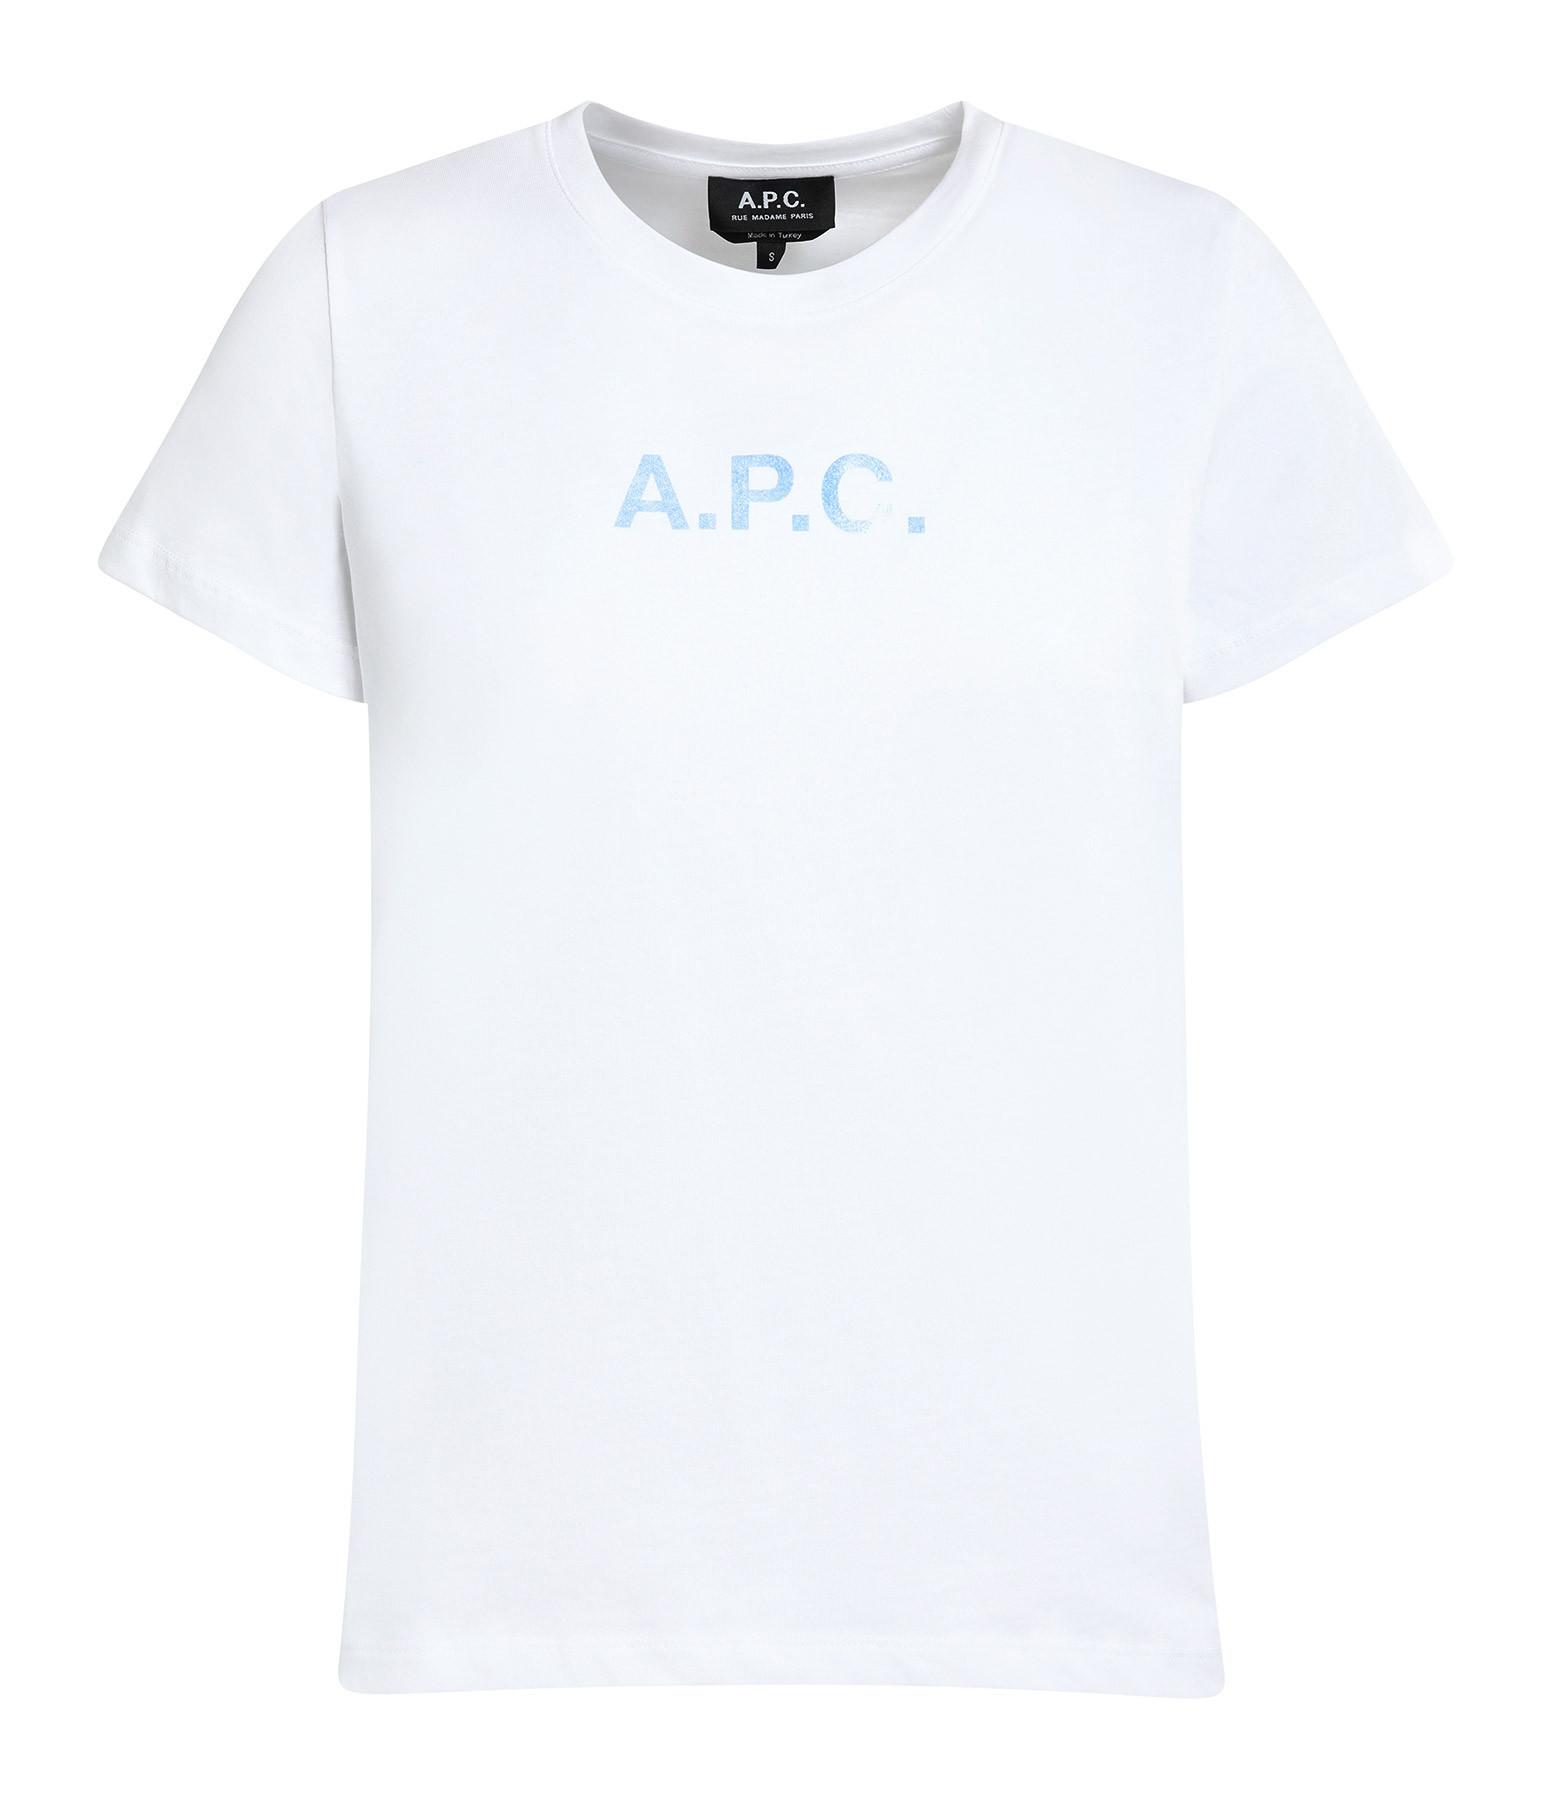 A.P.C. - Tee-shirt Stamp Jersey Blanc